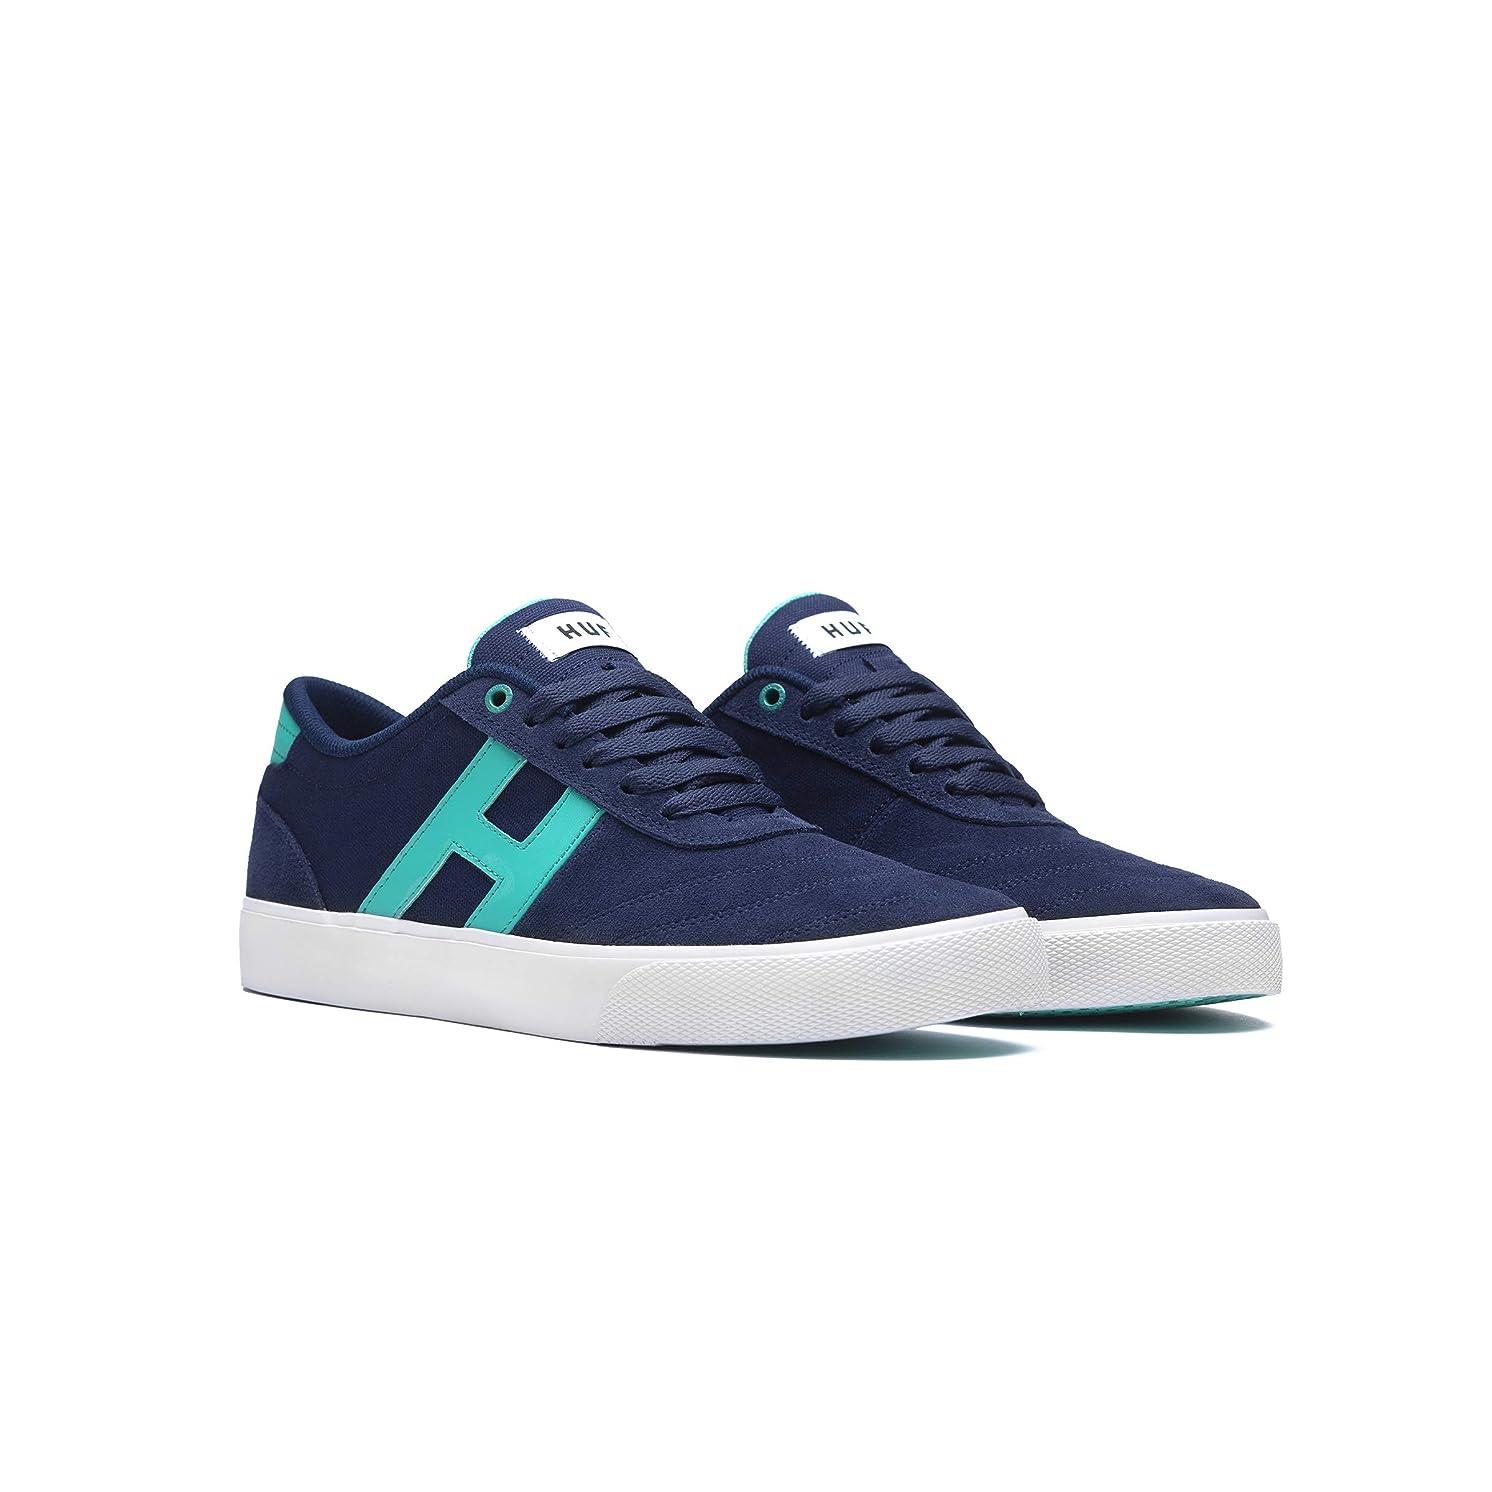 HUF Skateboard Shoes Galaxy Navy